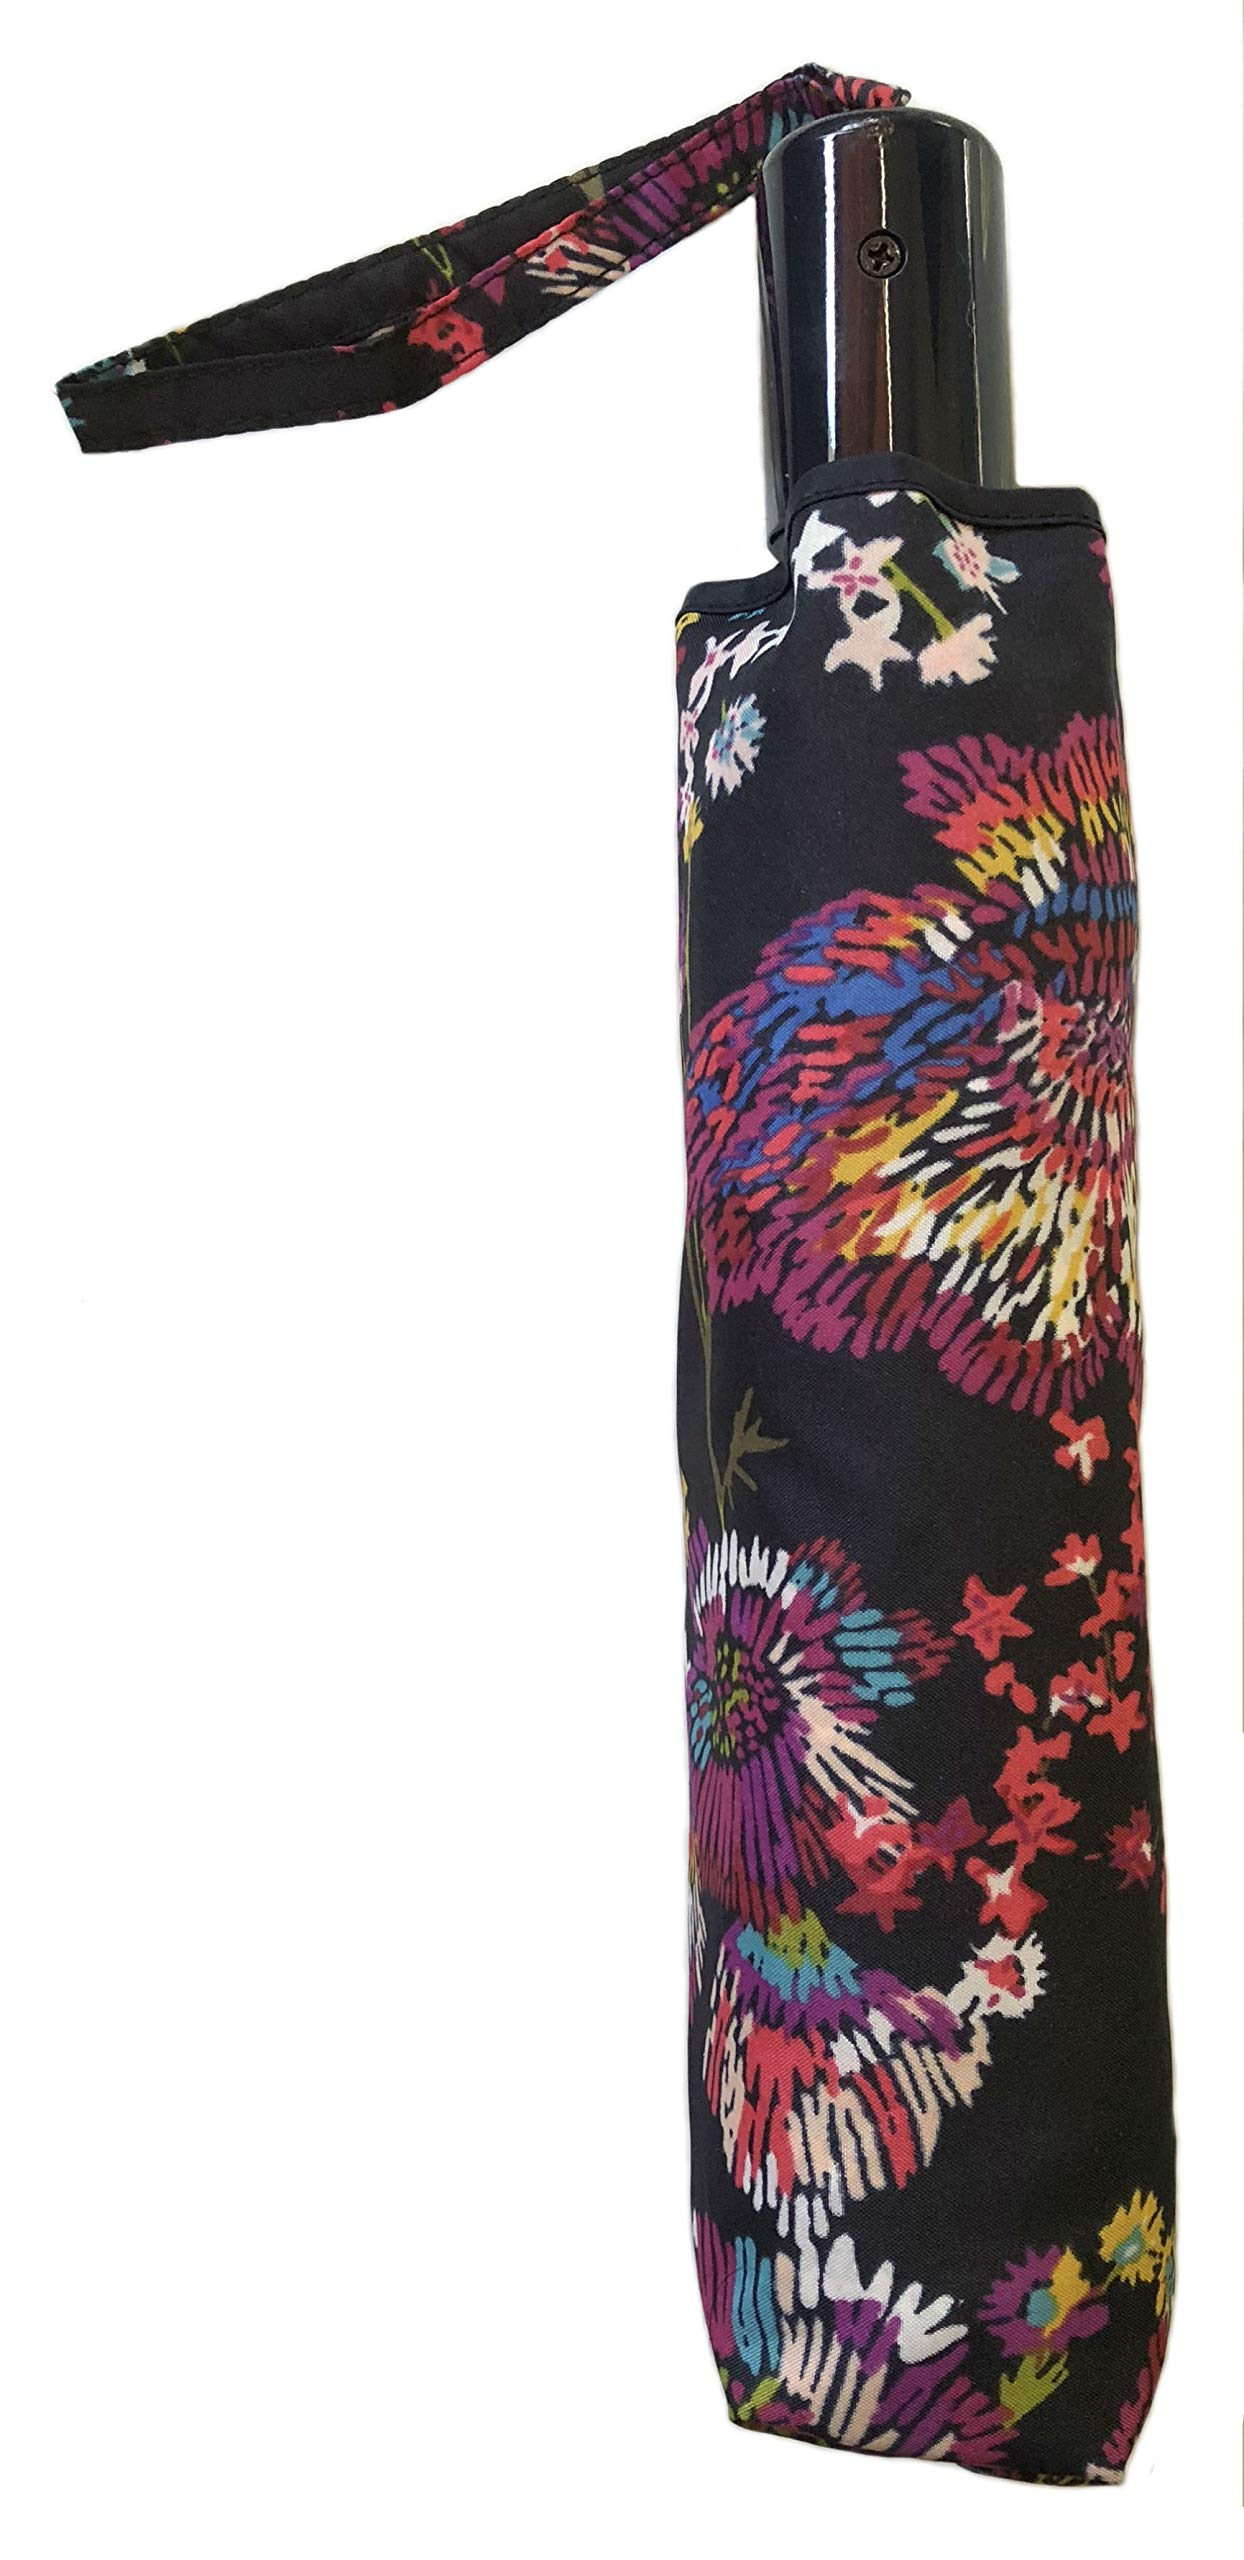 Vera Bradley Umbrella in Midnight Wildflowers